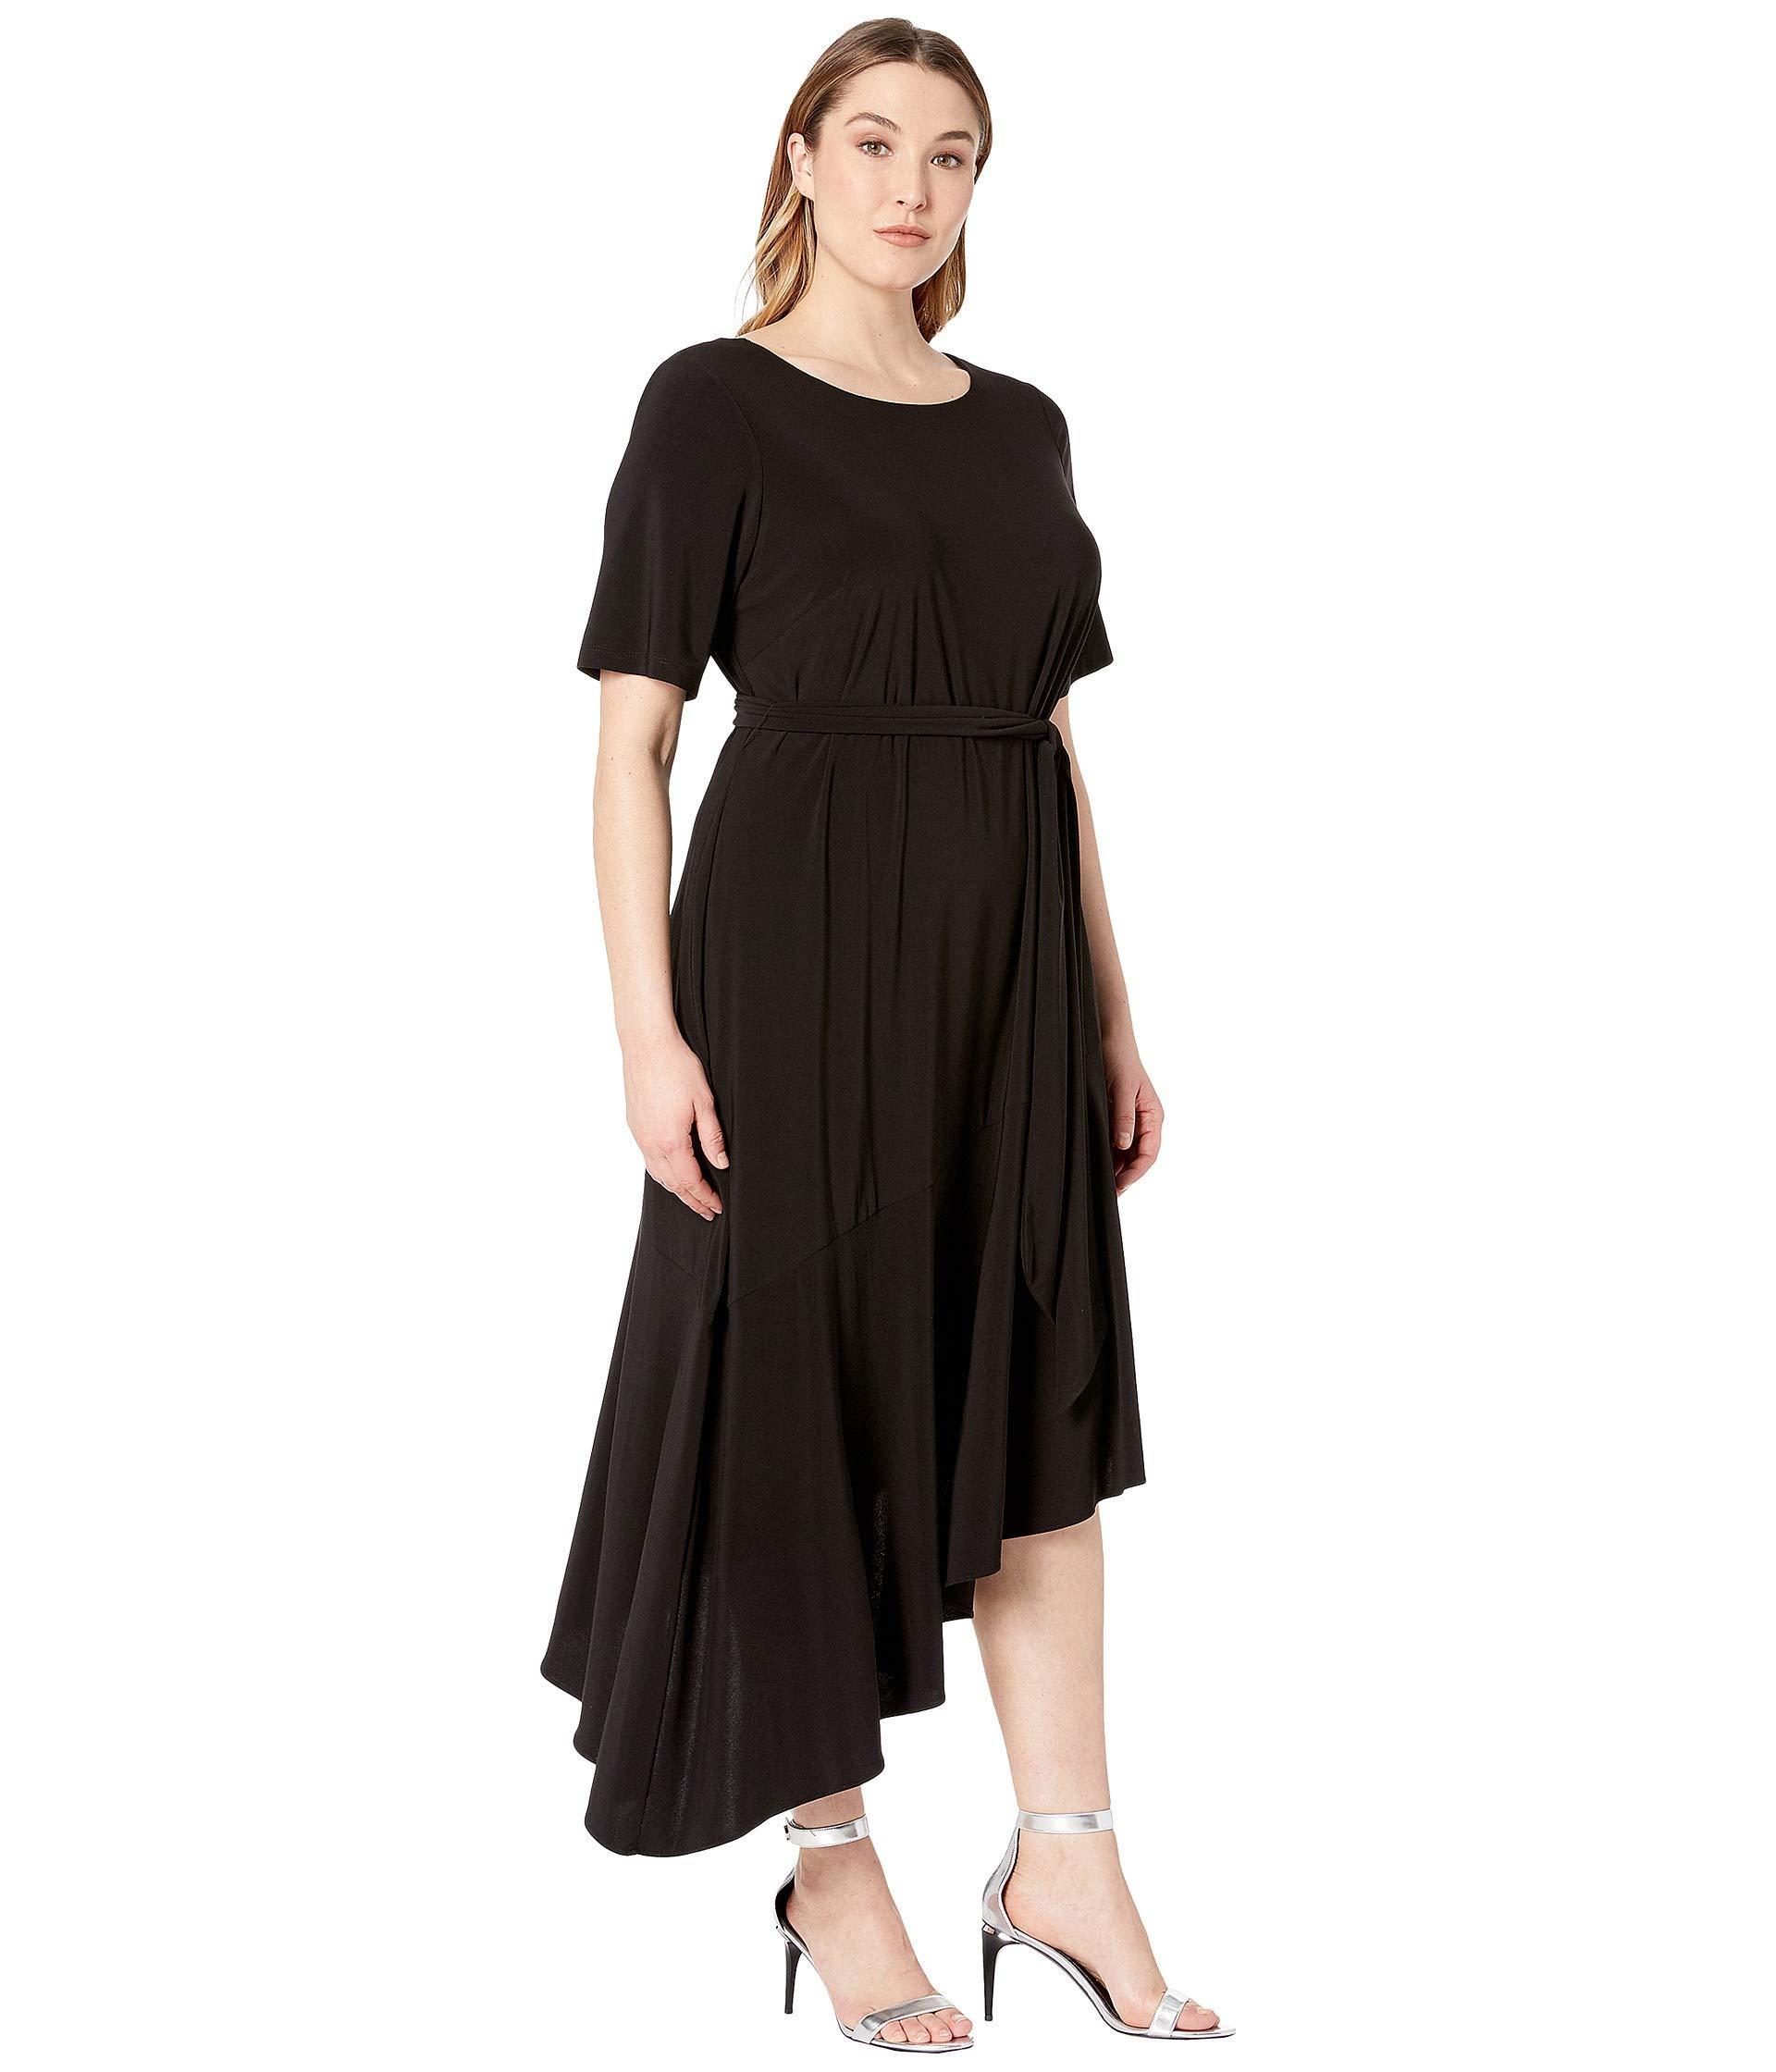 fdc19b97d645 Lyst - Adrianna Papell Plus Size Jersey Asymmetrical Ruffle Dress (black)  Women's Dress in Black